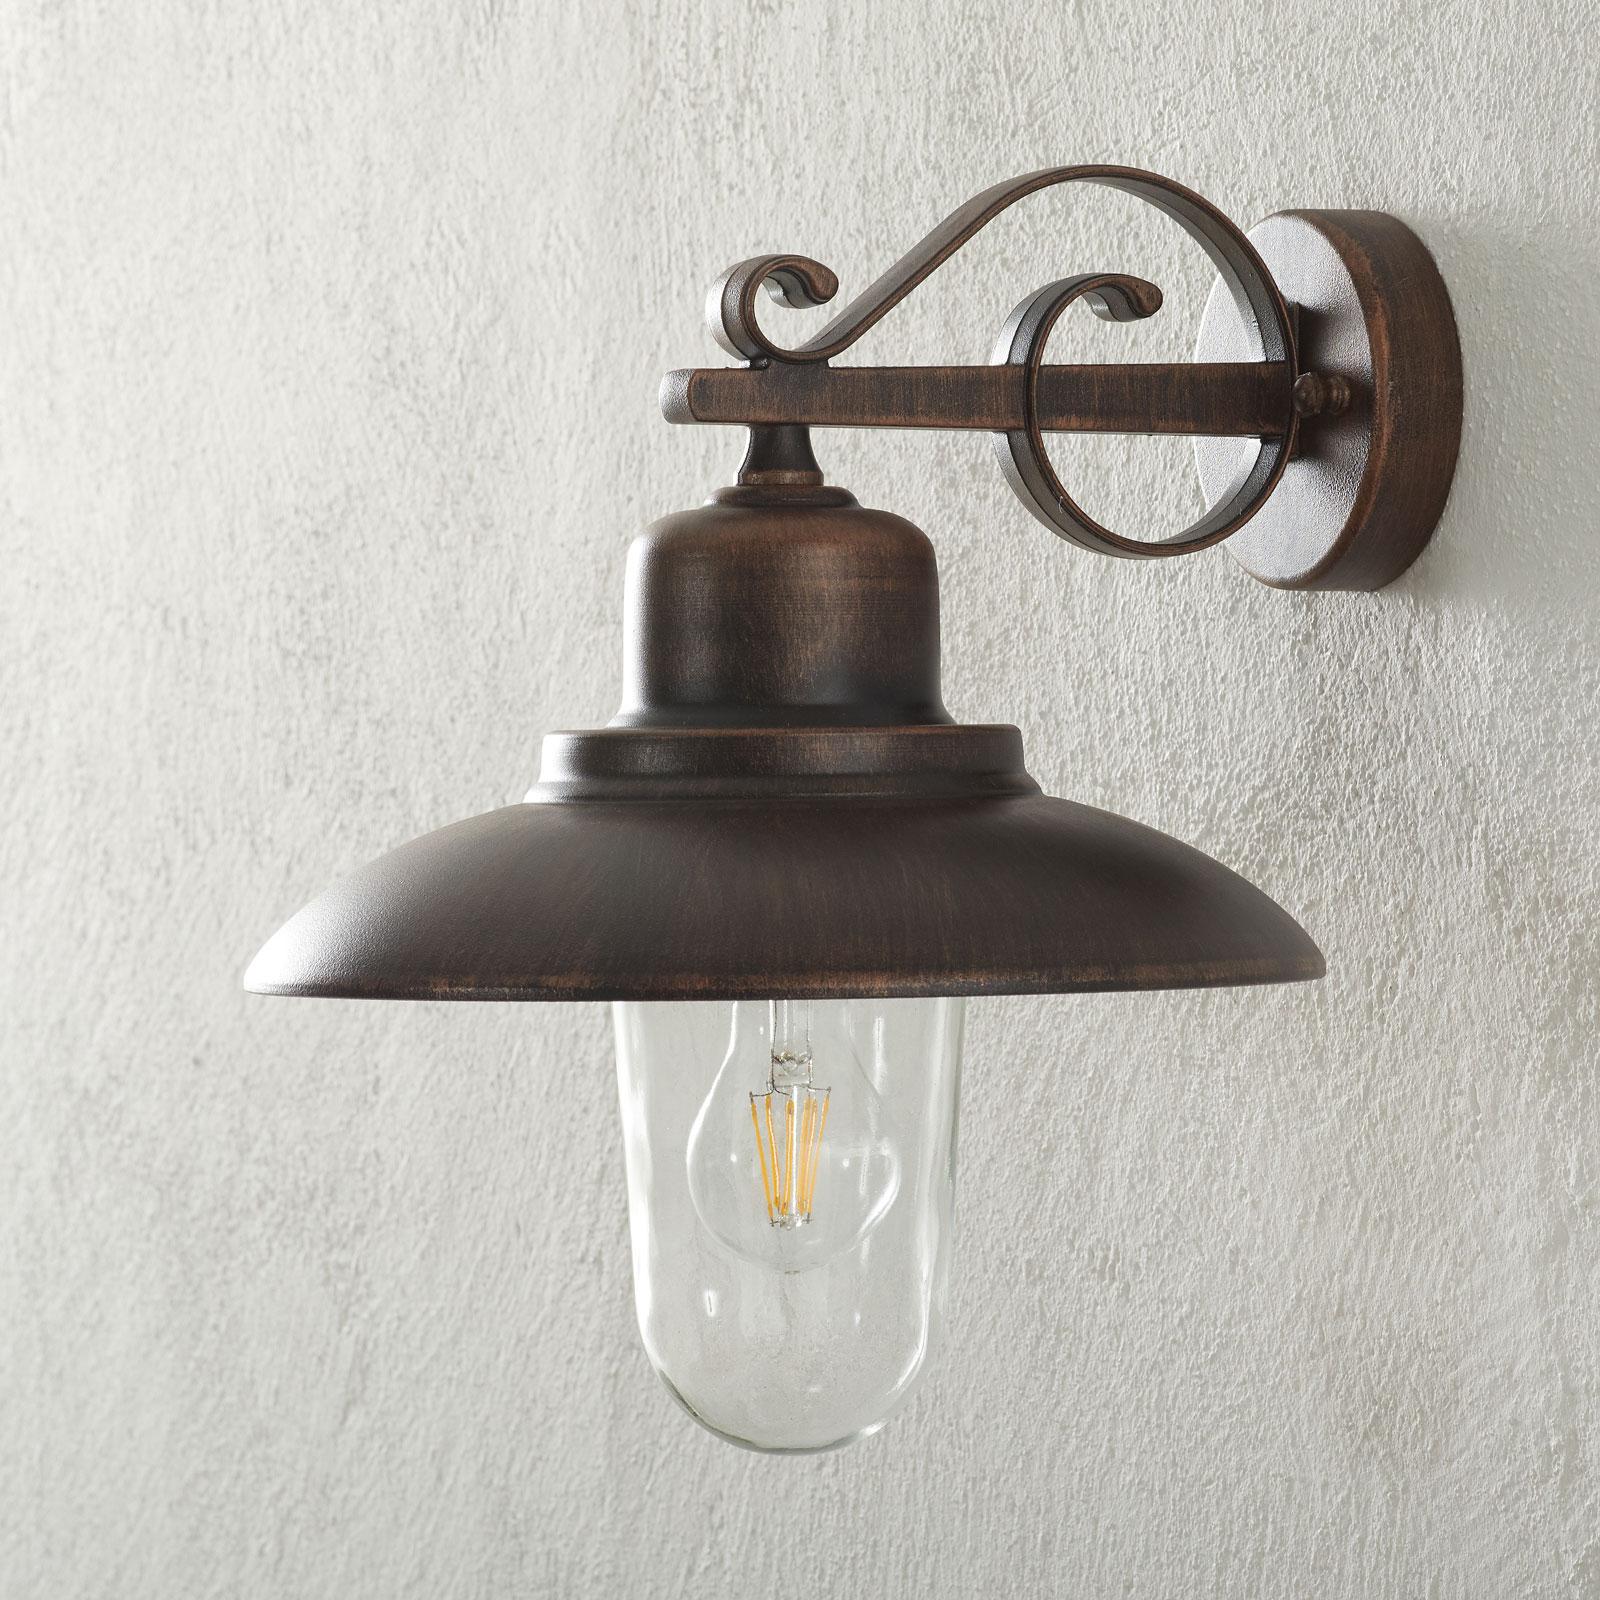 Buitenwandlamp 4101, koper antiek